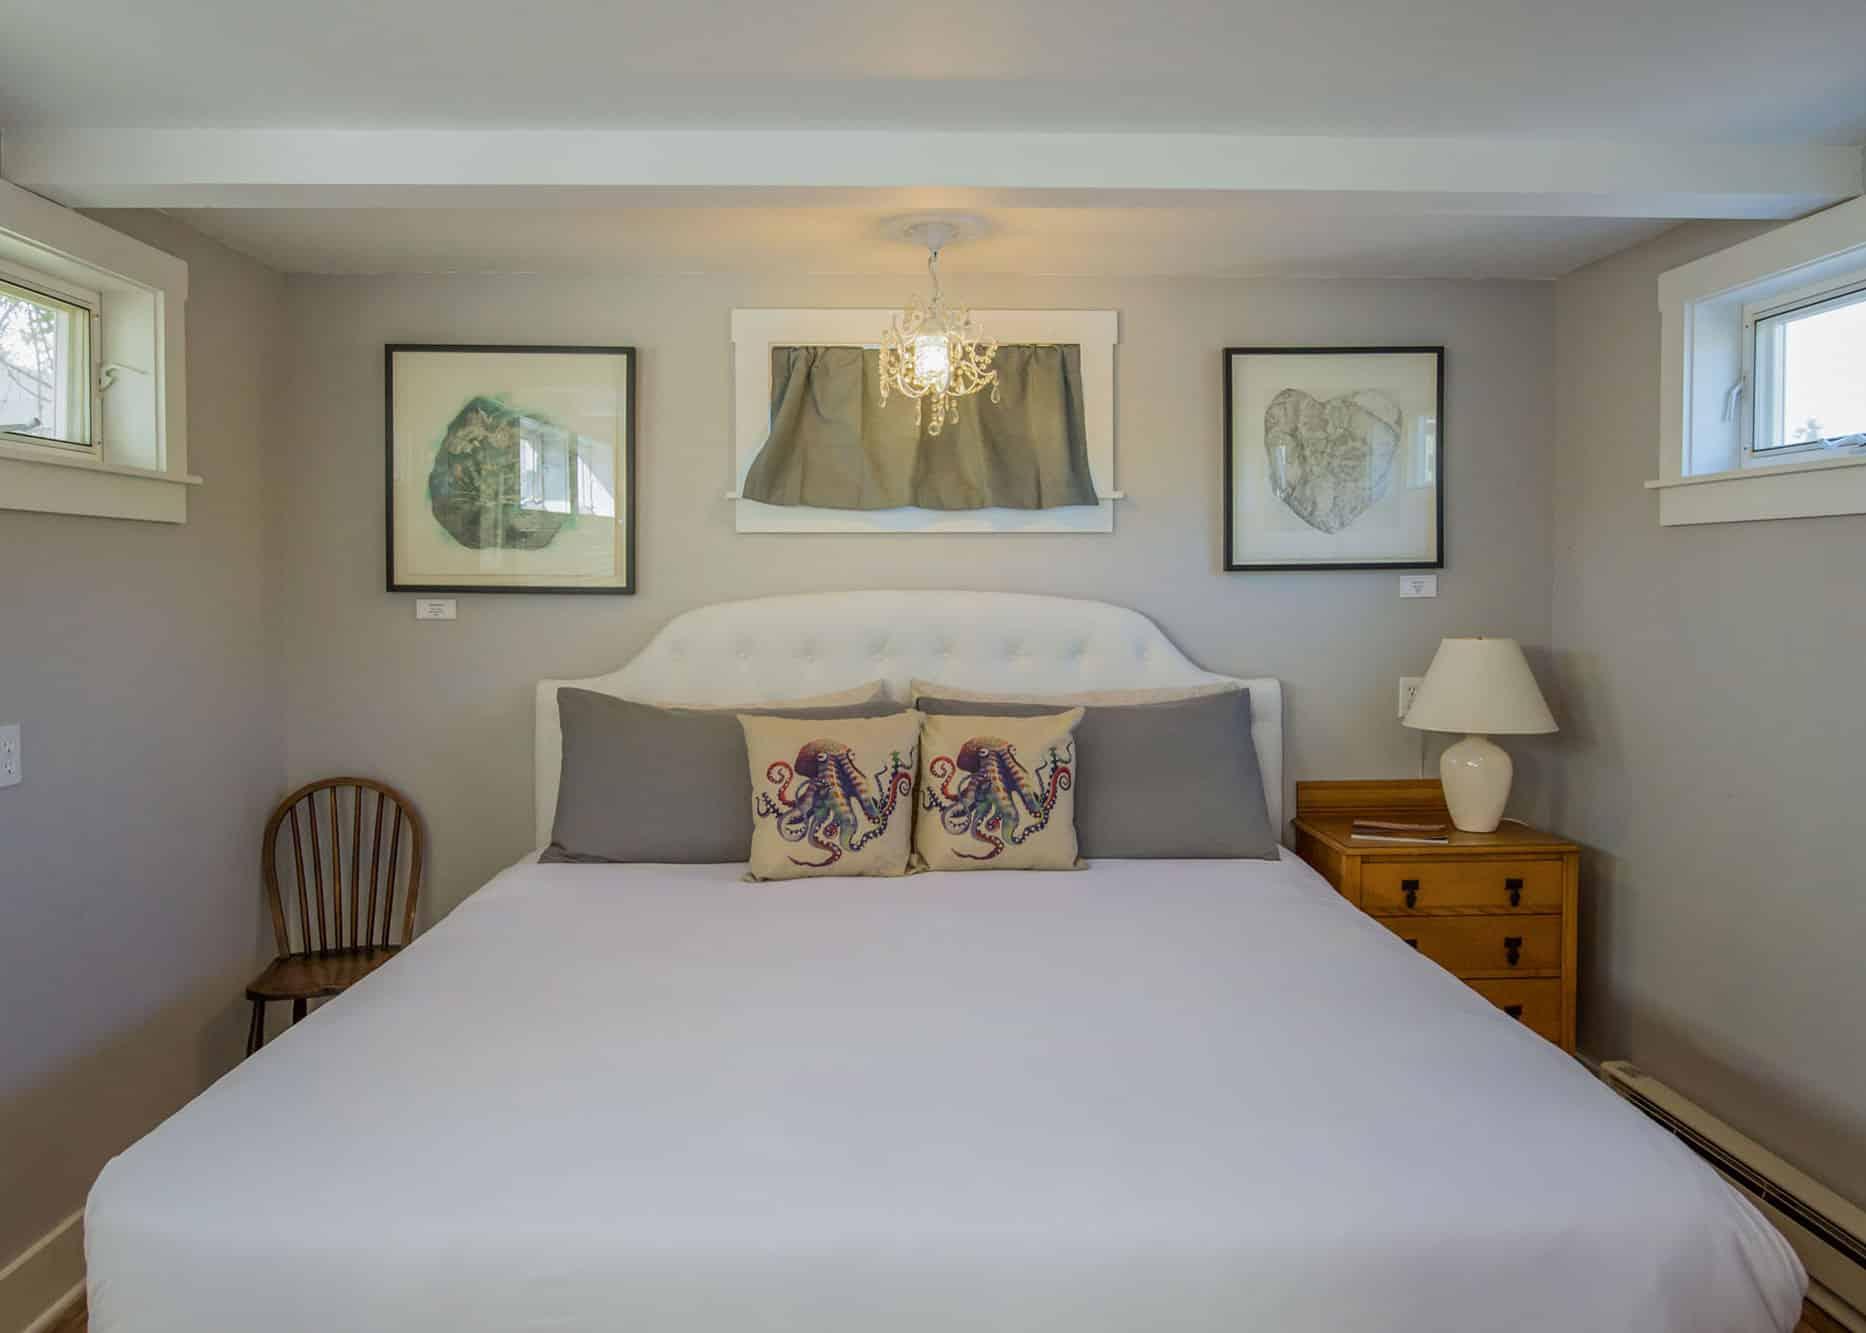 the-edenwild-inn-lopez-island-lodging-2020-room-09-01